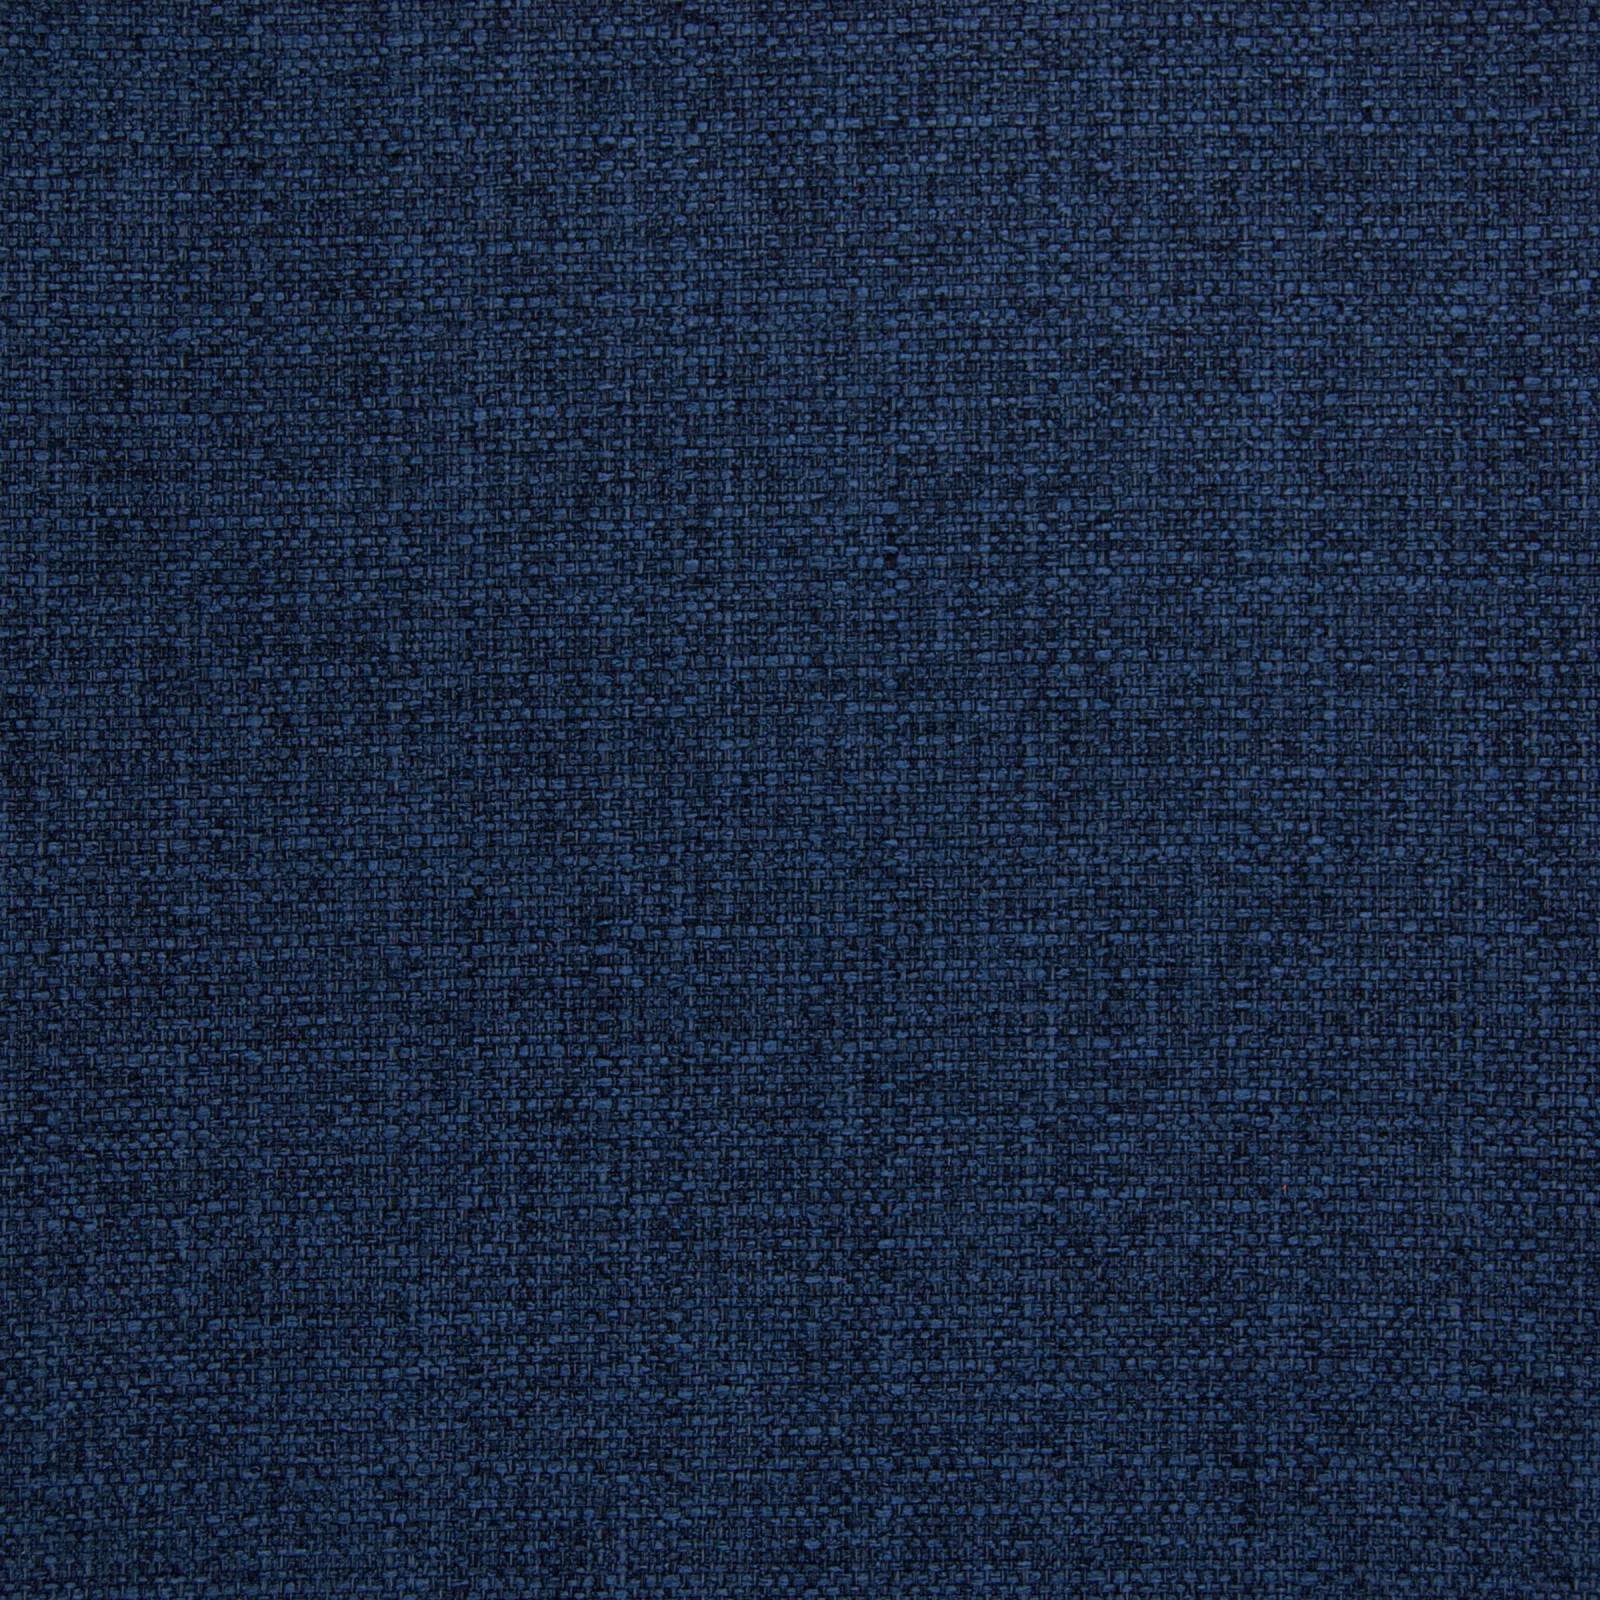 B5594 Indigo Greenhouse Fabrics